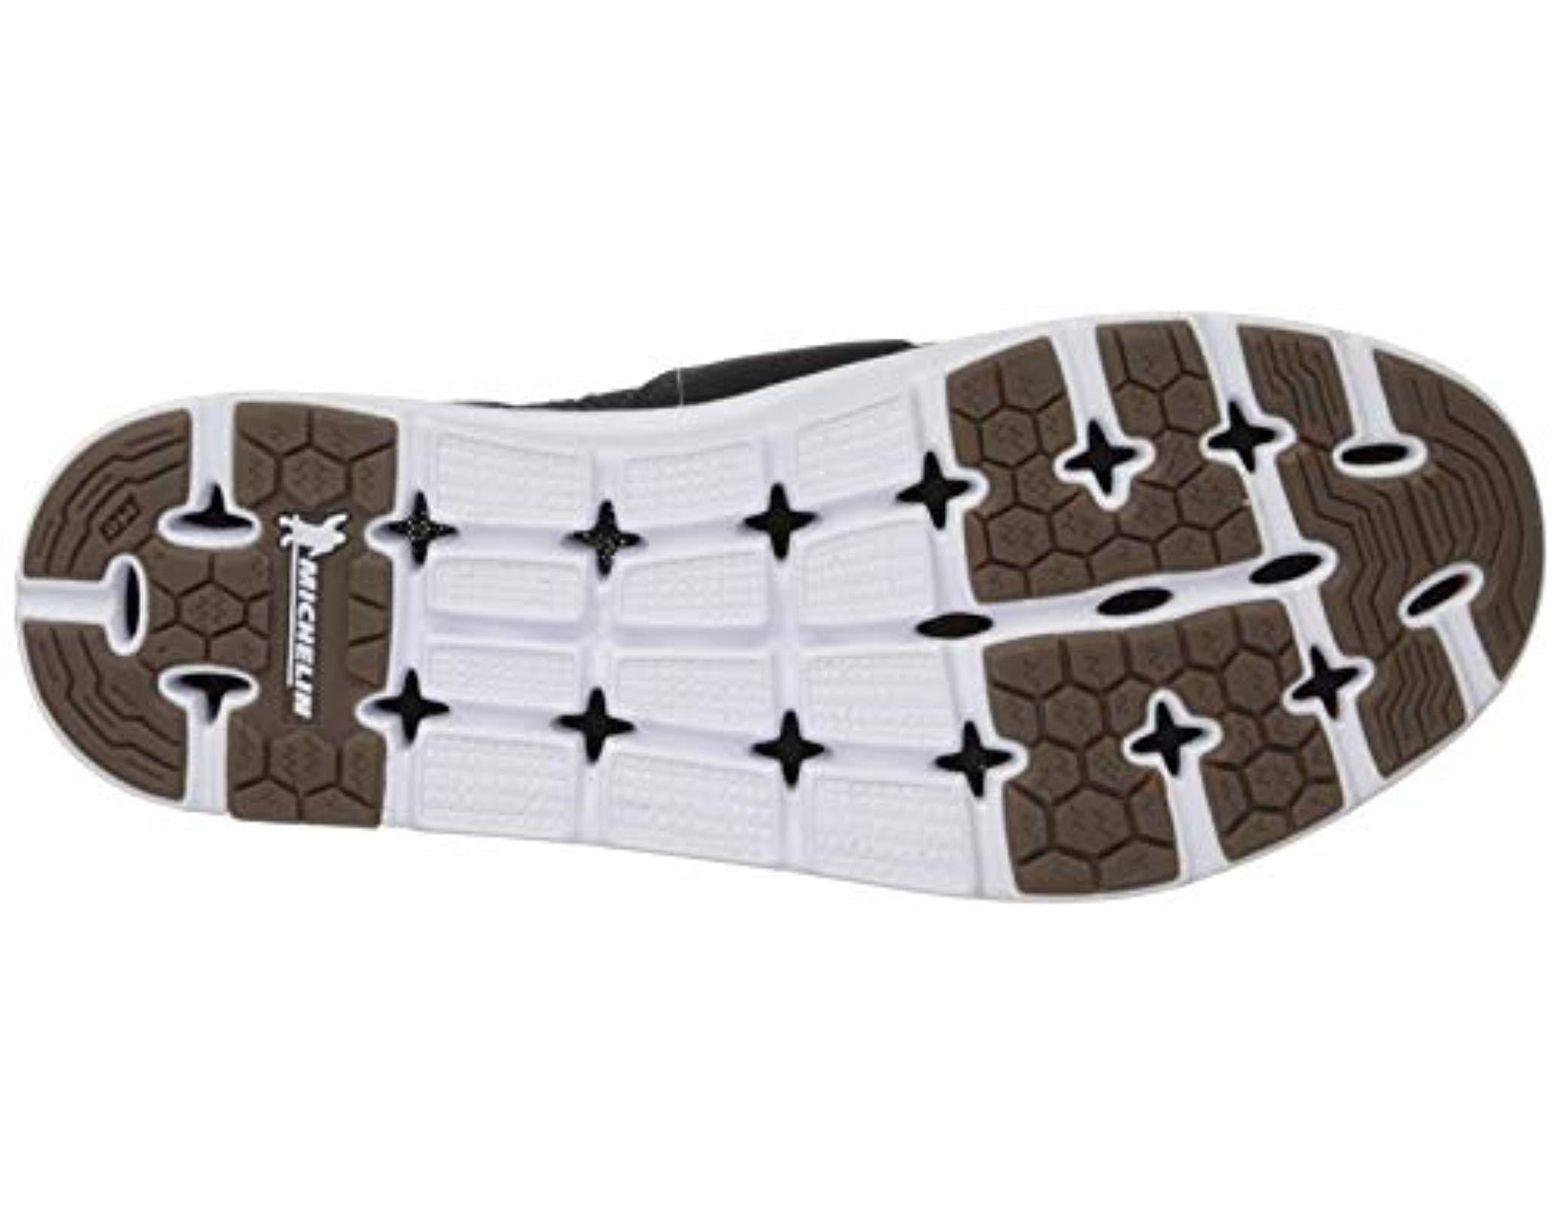 225b4c69b972 Lyst - Quiksilver Slip-on Shoes in Black for Men